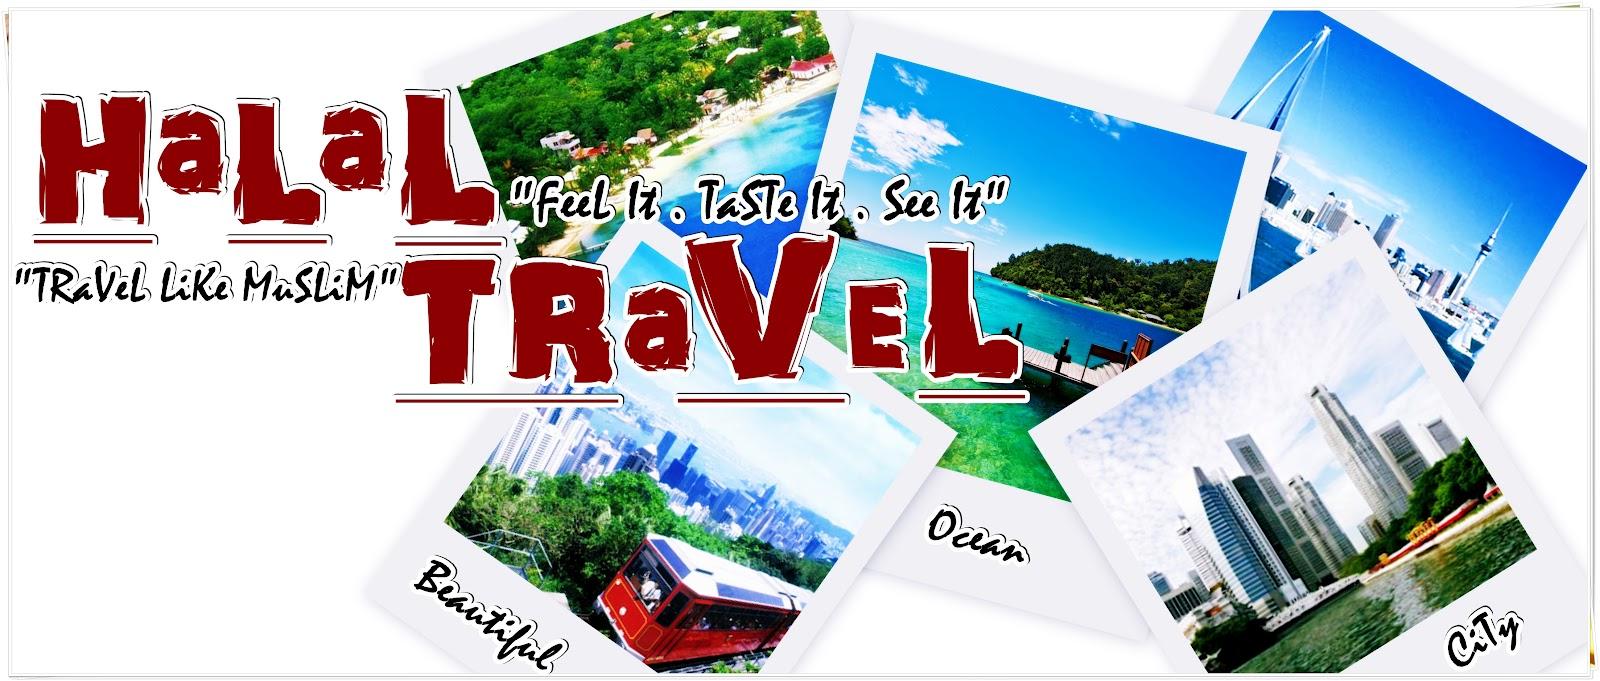 Unique Travel Agency The Unique Travel Agency